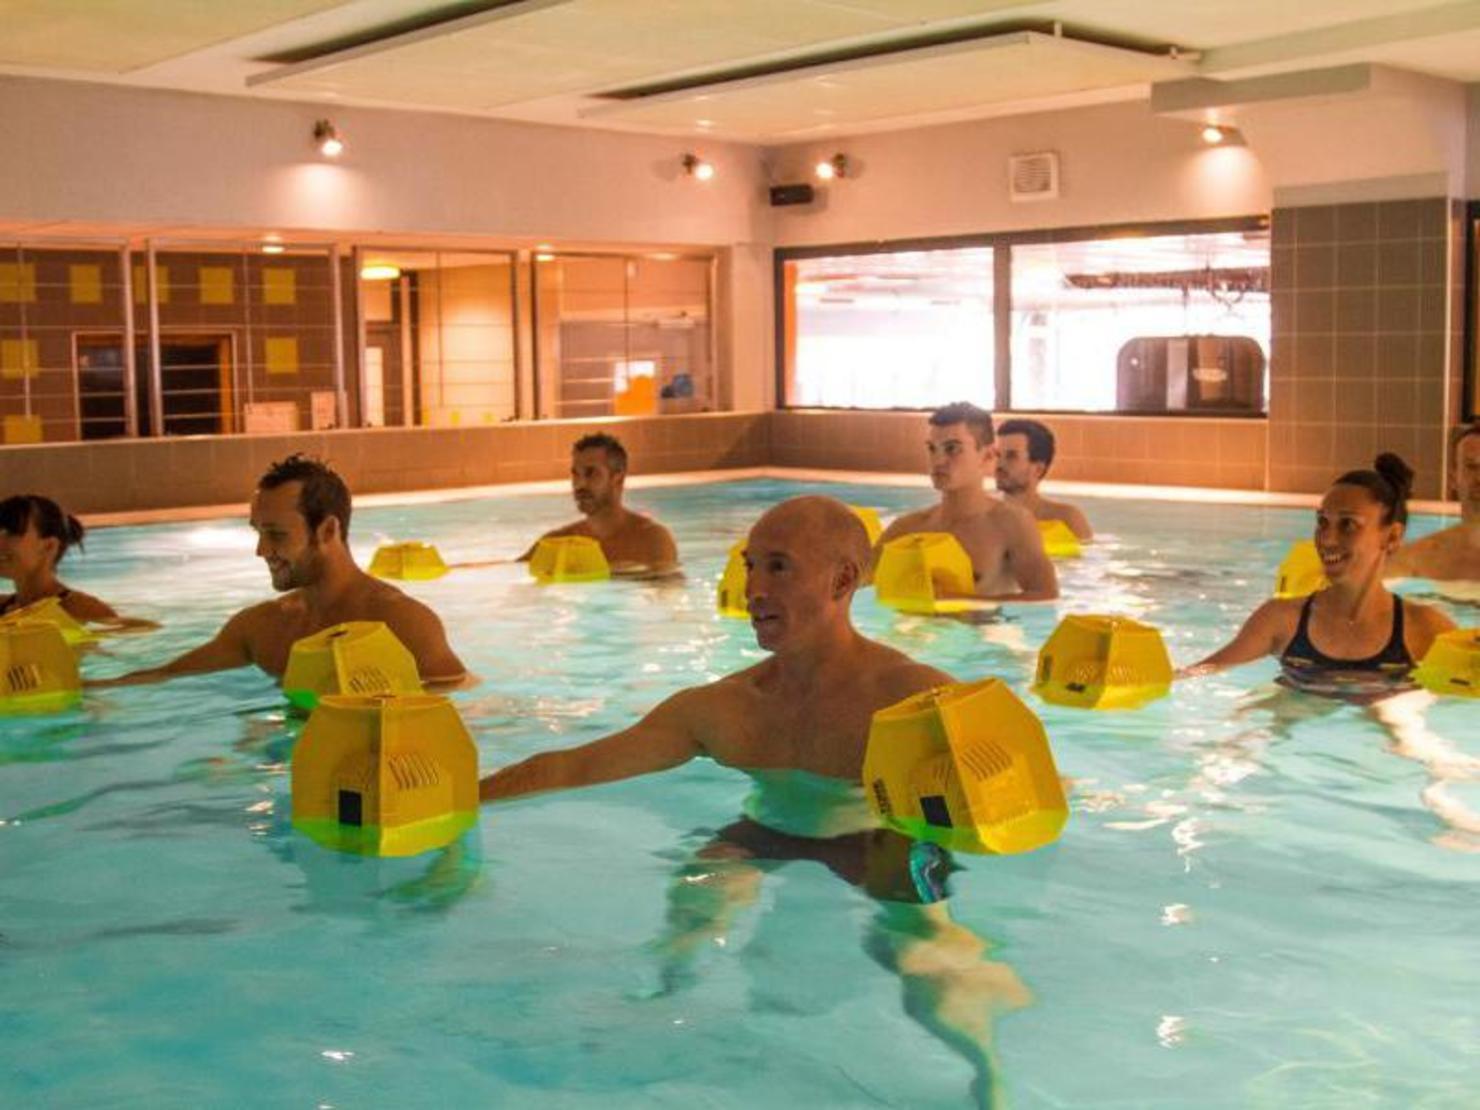 Le 36 boulevard rennes tarifs avis horaires essai for Tarif piscine rennes